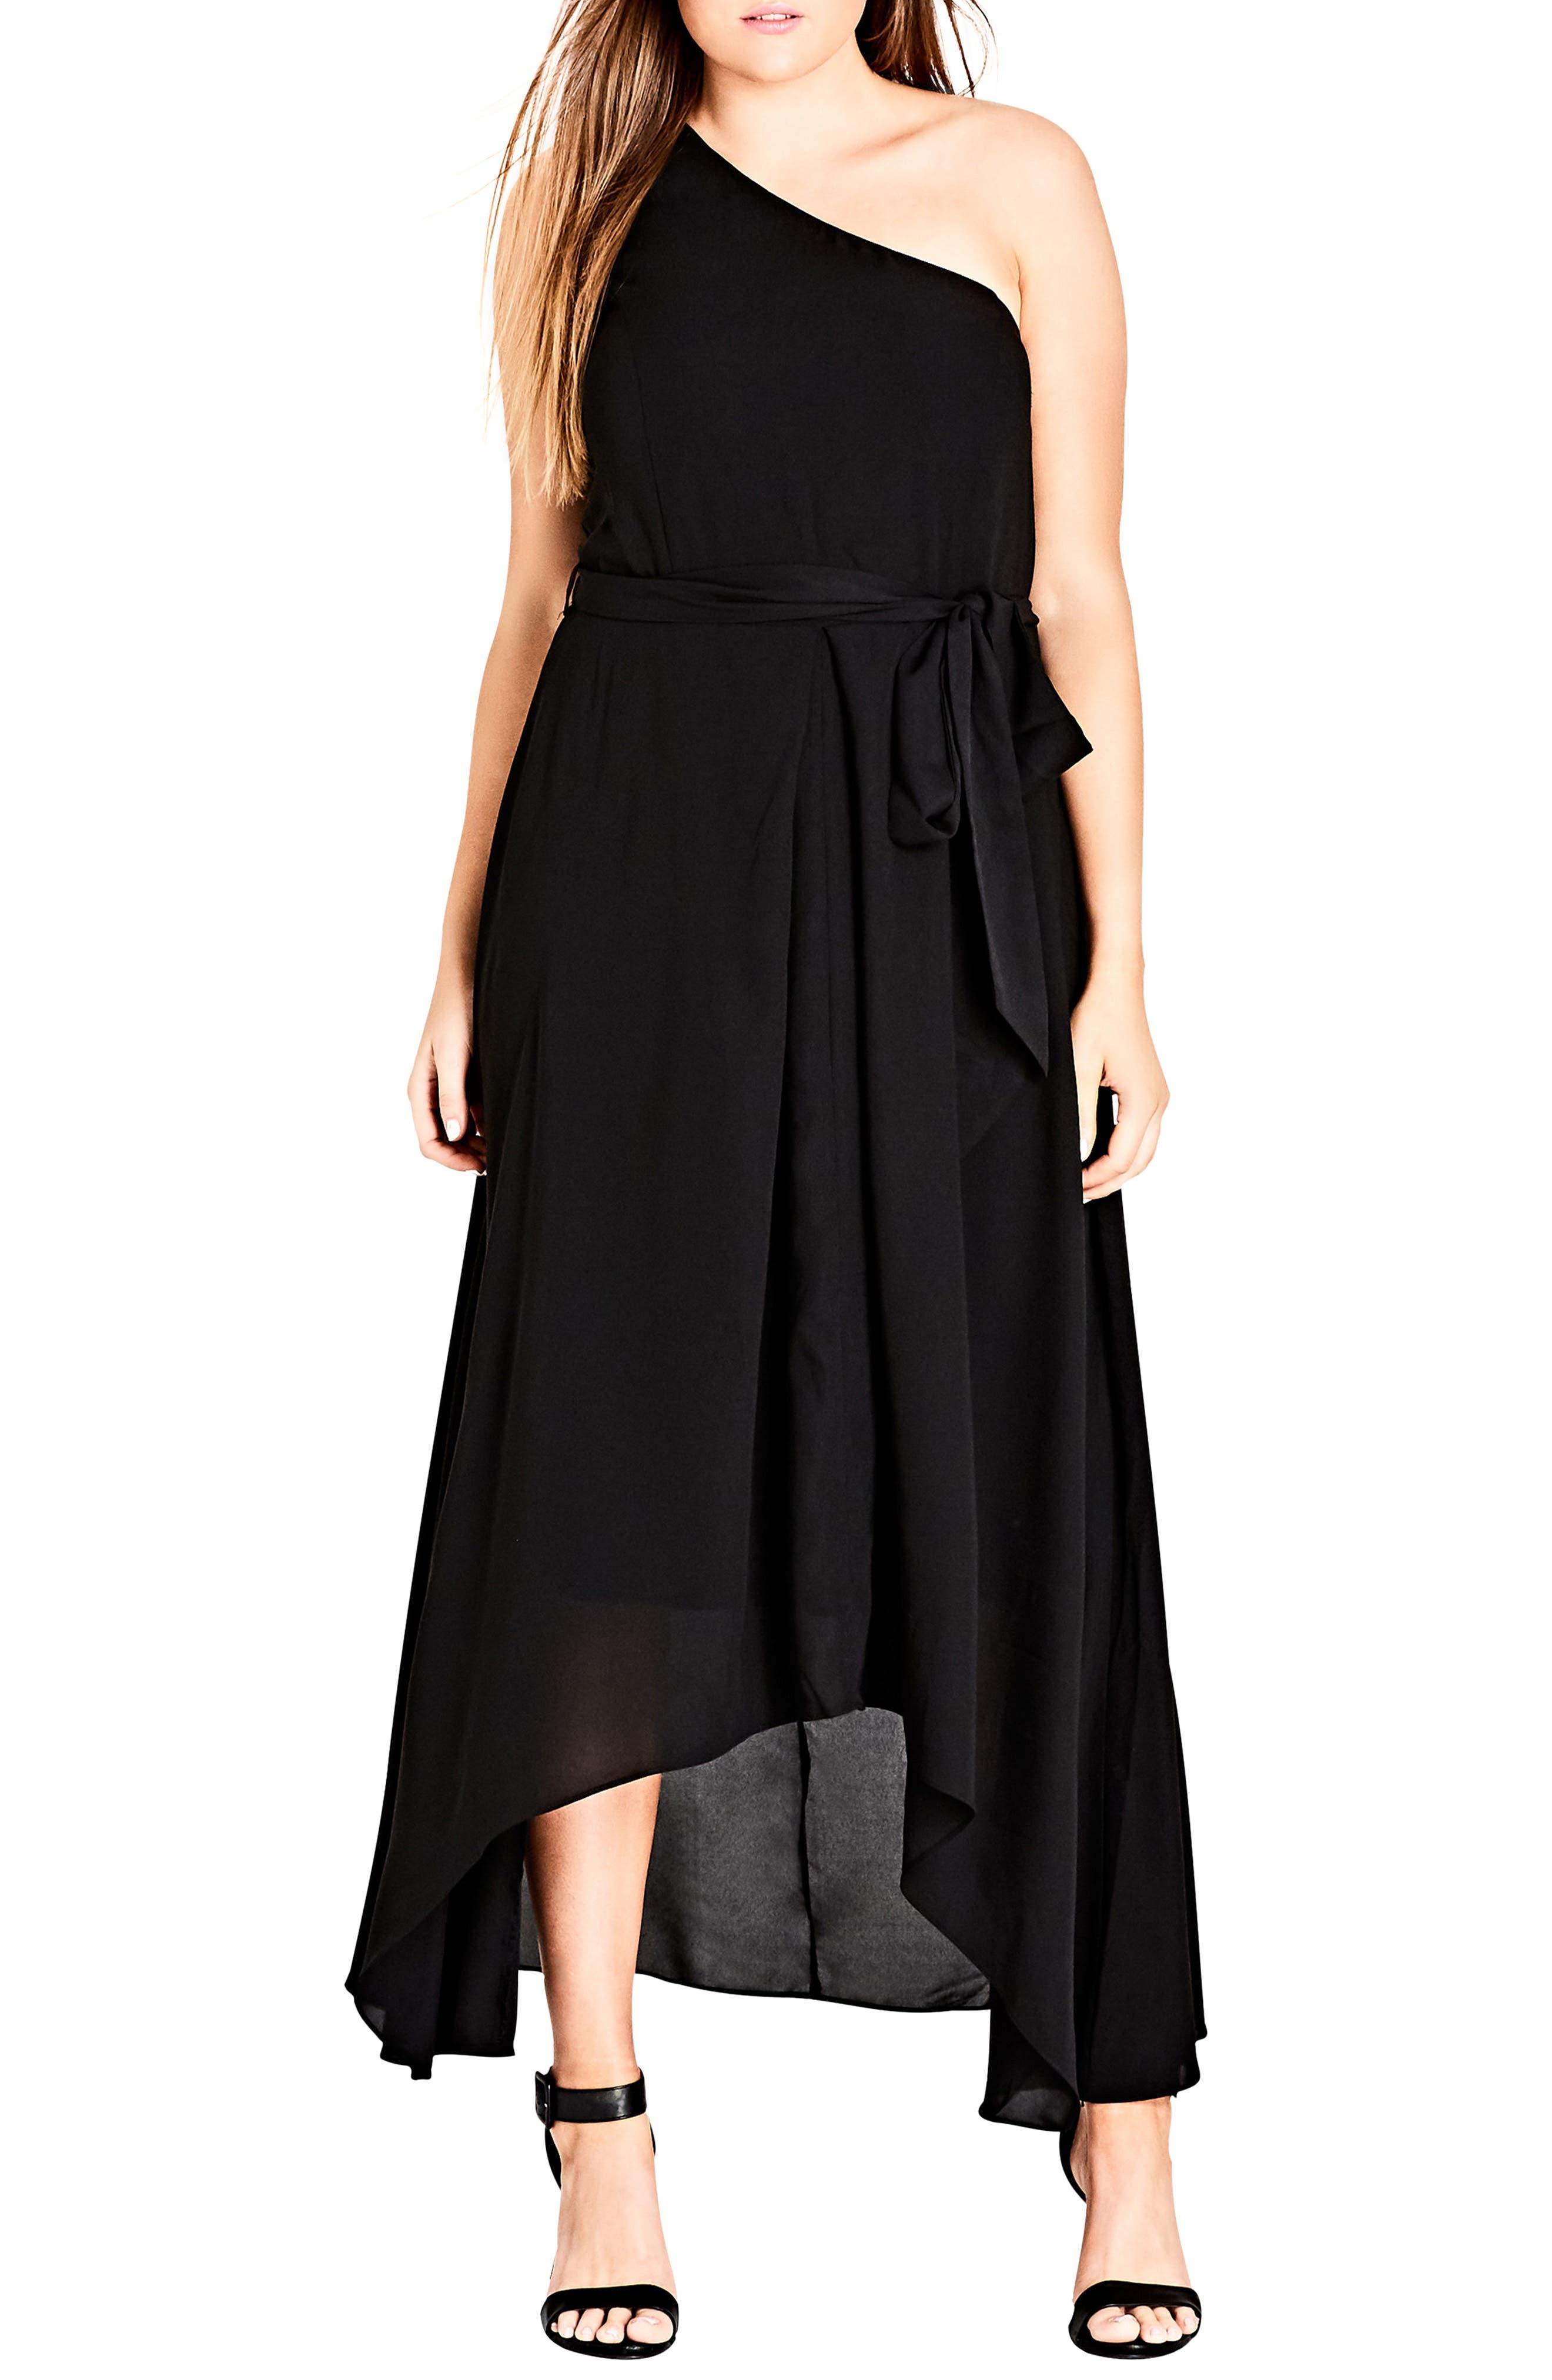 One Love Maxi Dress,                             Main thumbnail 1, color,                             Black